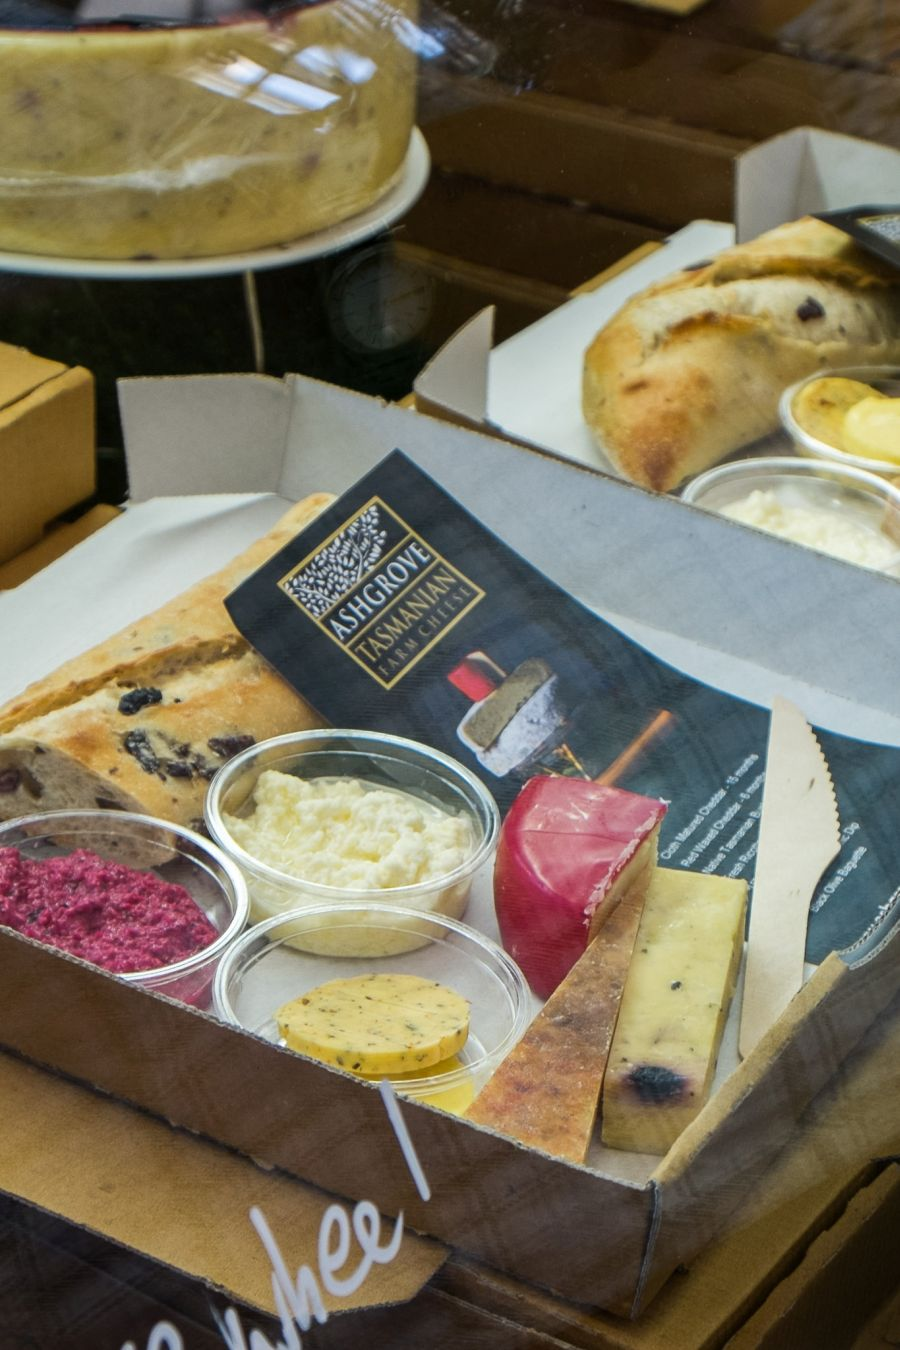 Ashgrove Tasmanian Farm cheese tasting boxes